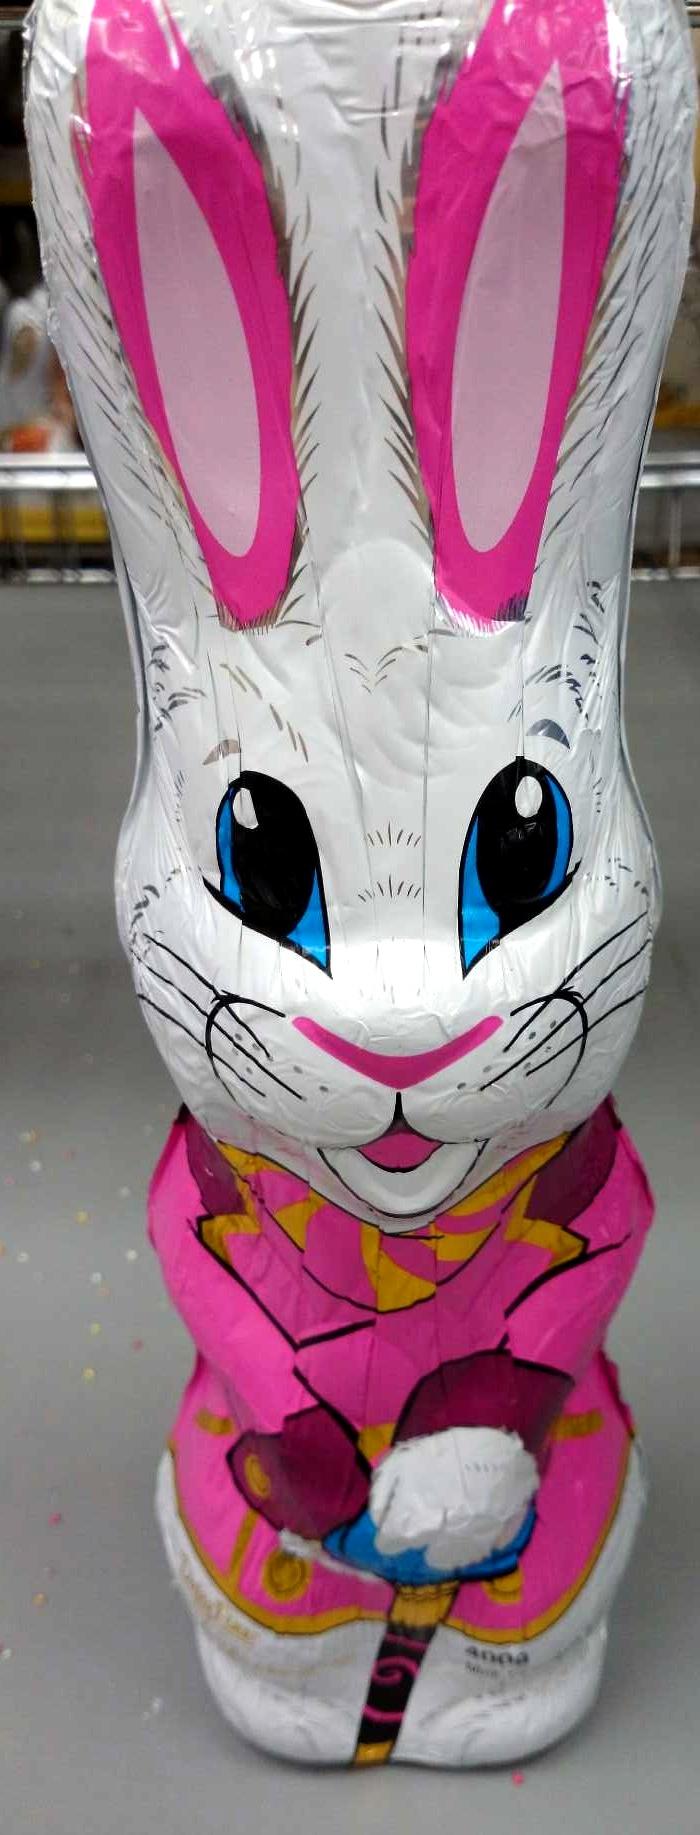 Chocolate Rabbit - Product - en